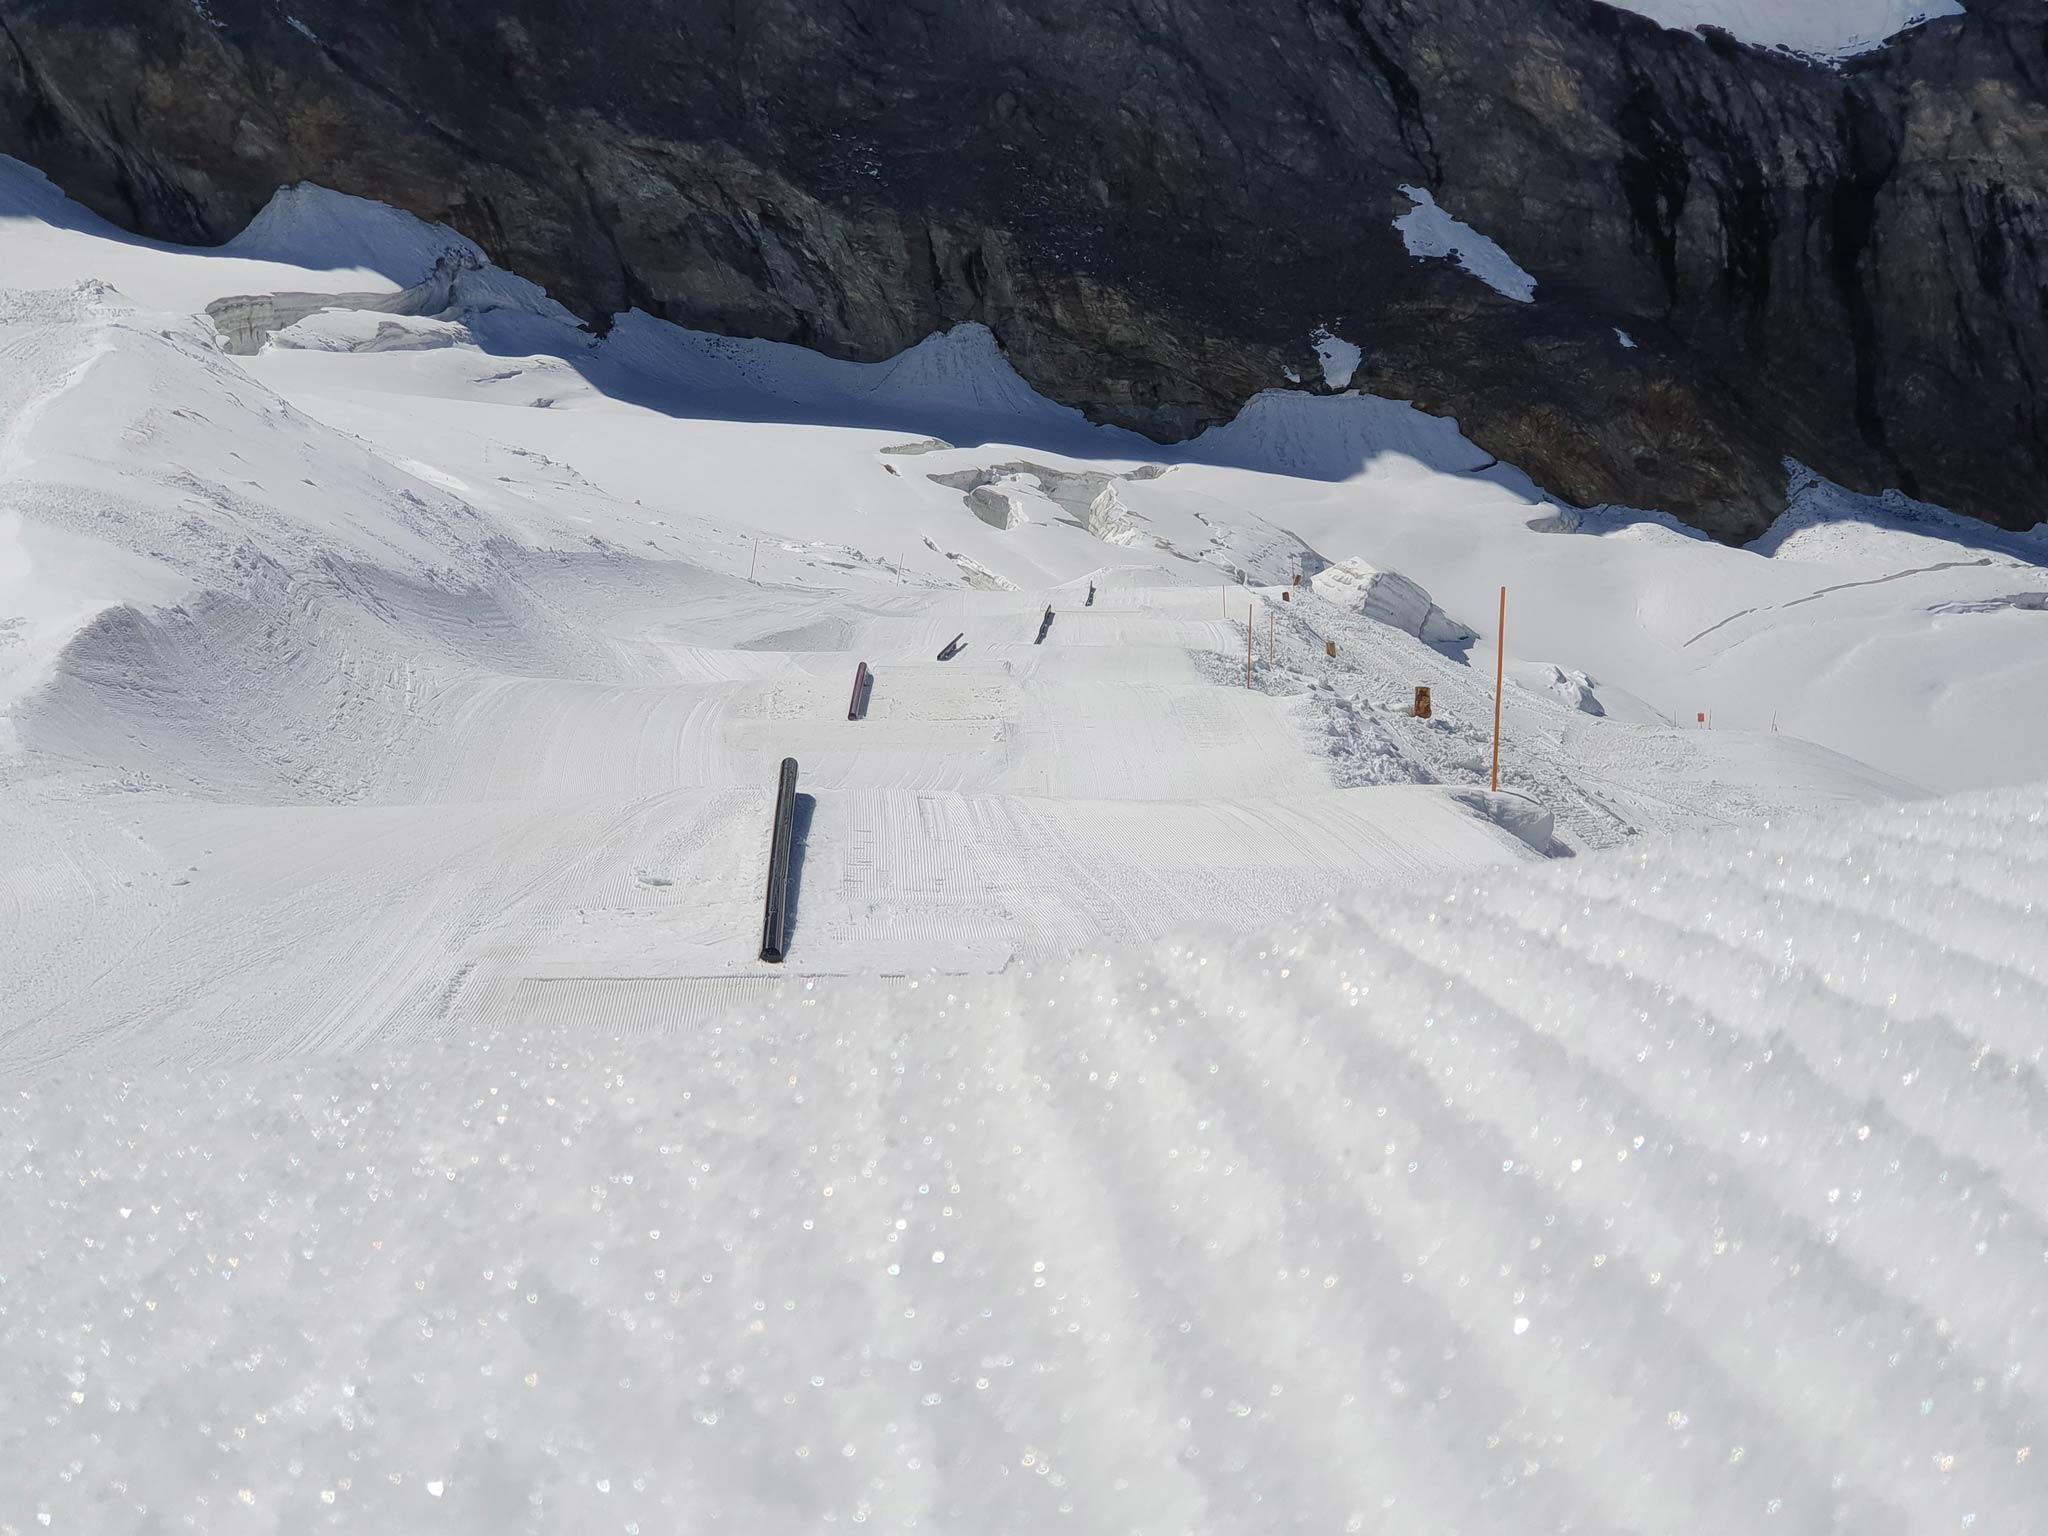 Blick auf die erste Rail Line im Snowpark Saas-Fee